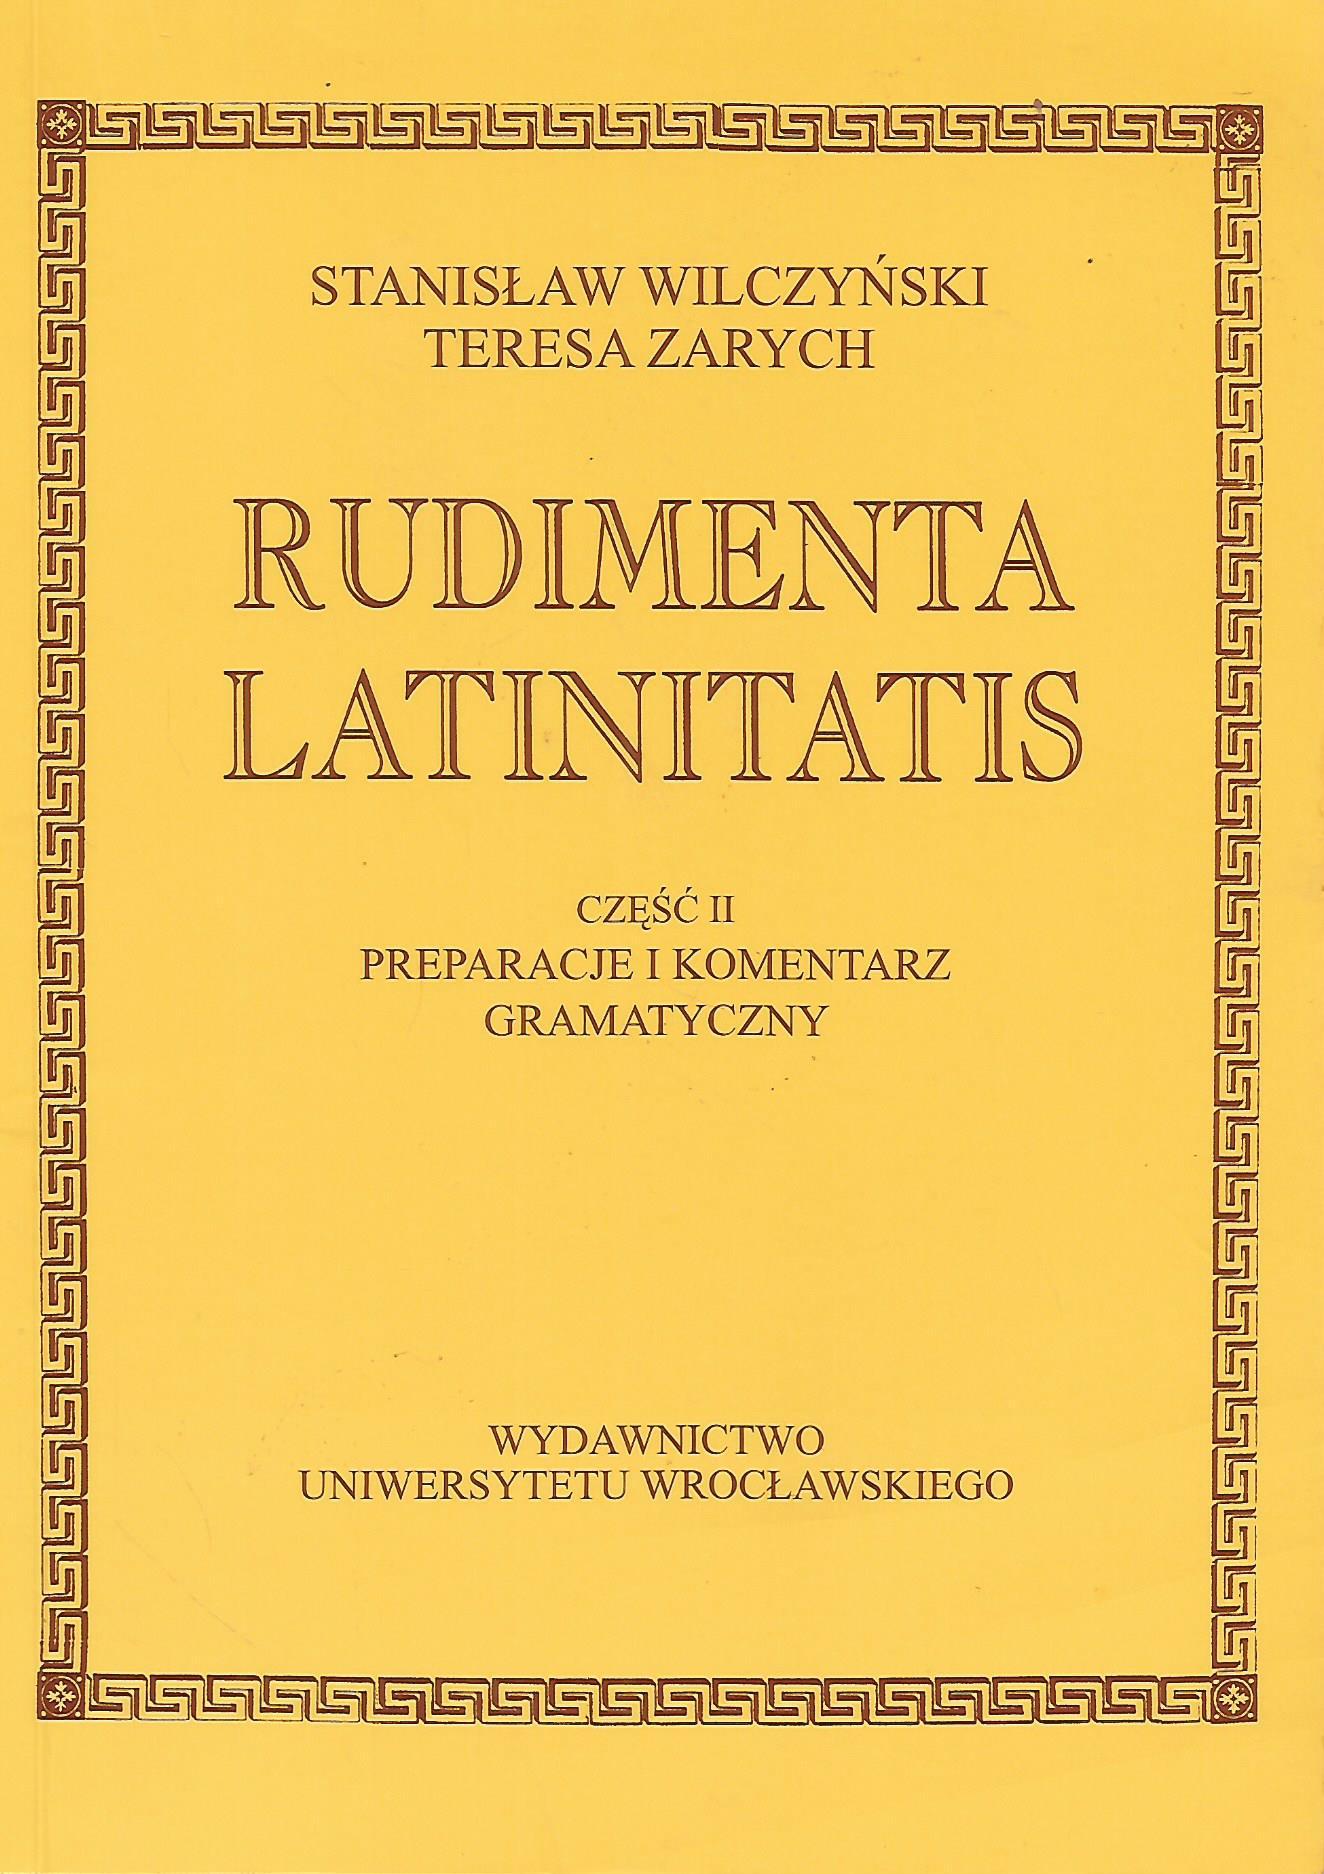 Rudimenta Latinitatis I-II